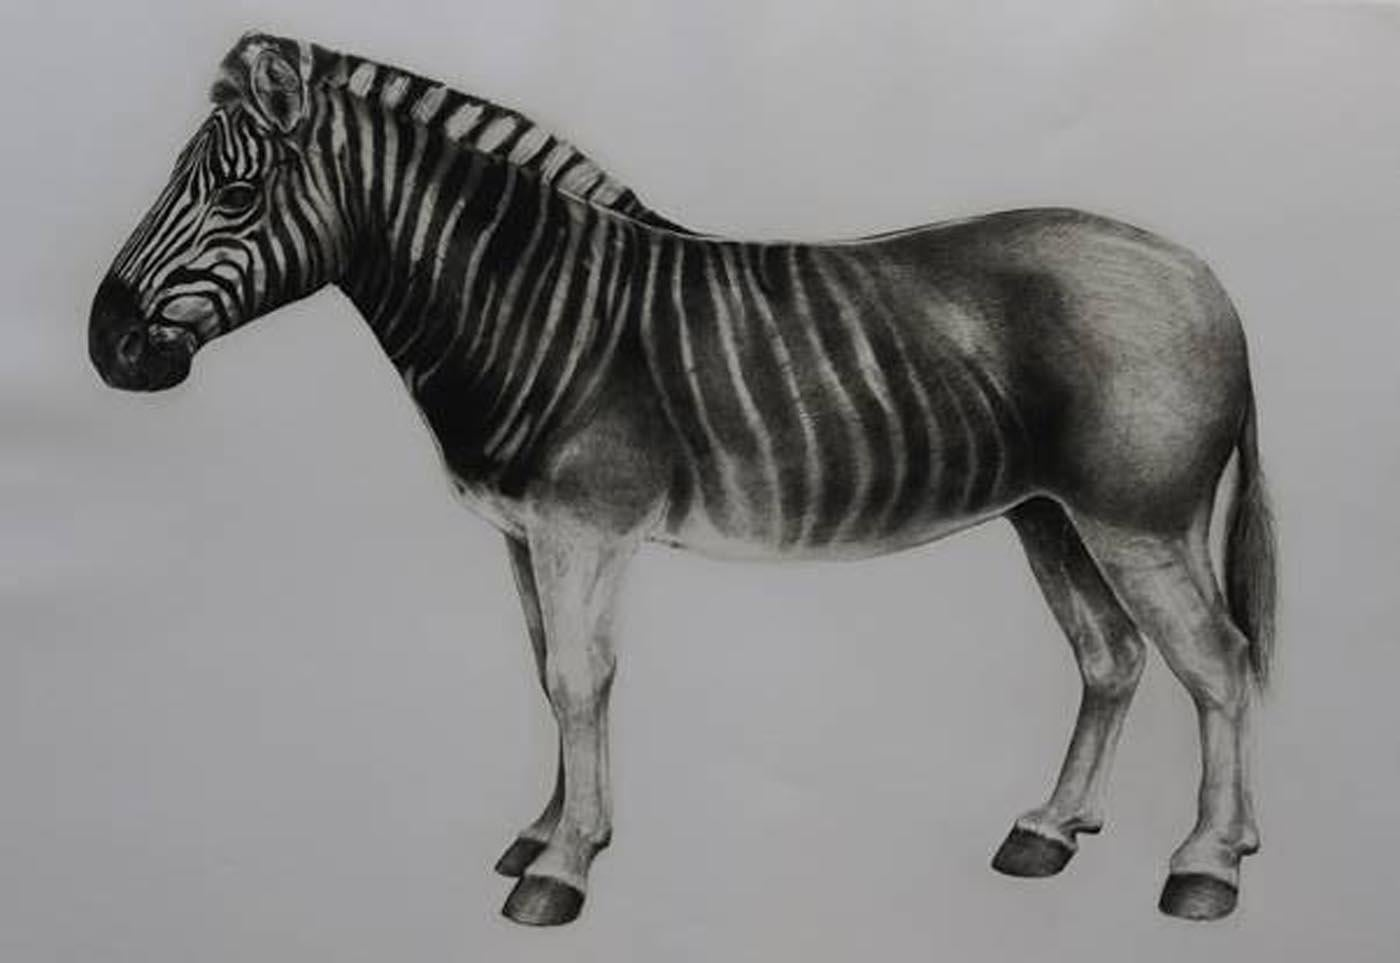 Quagga, animal print, limited edition print, affordable art for sale